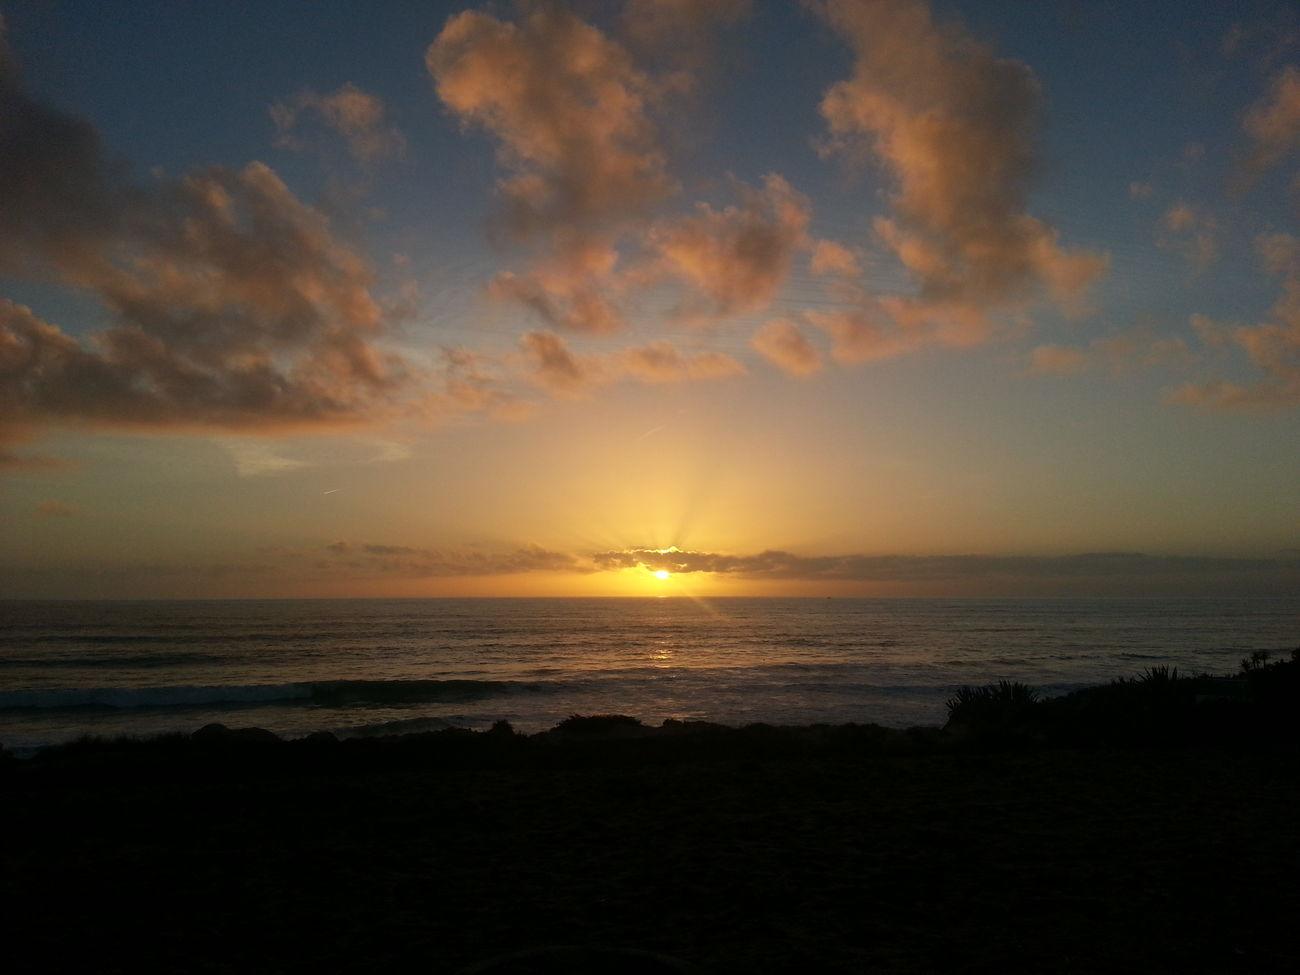 sunset #sun #clouds #skylovers #sky #nature #beautifulinnature #naturalbeauty photography landscape Portugaloteuolhar Sunset Enjoying Nature Beachphotography